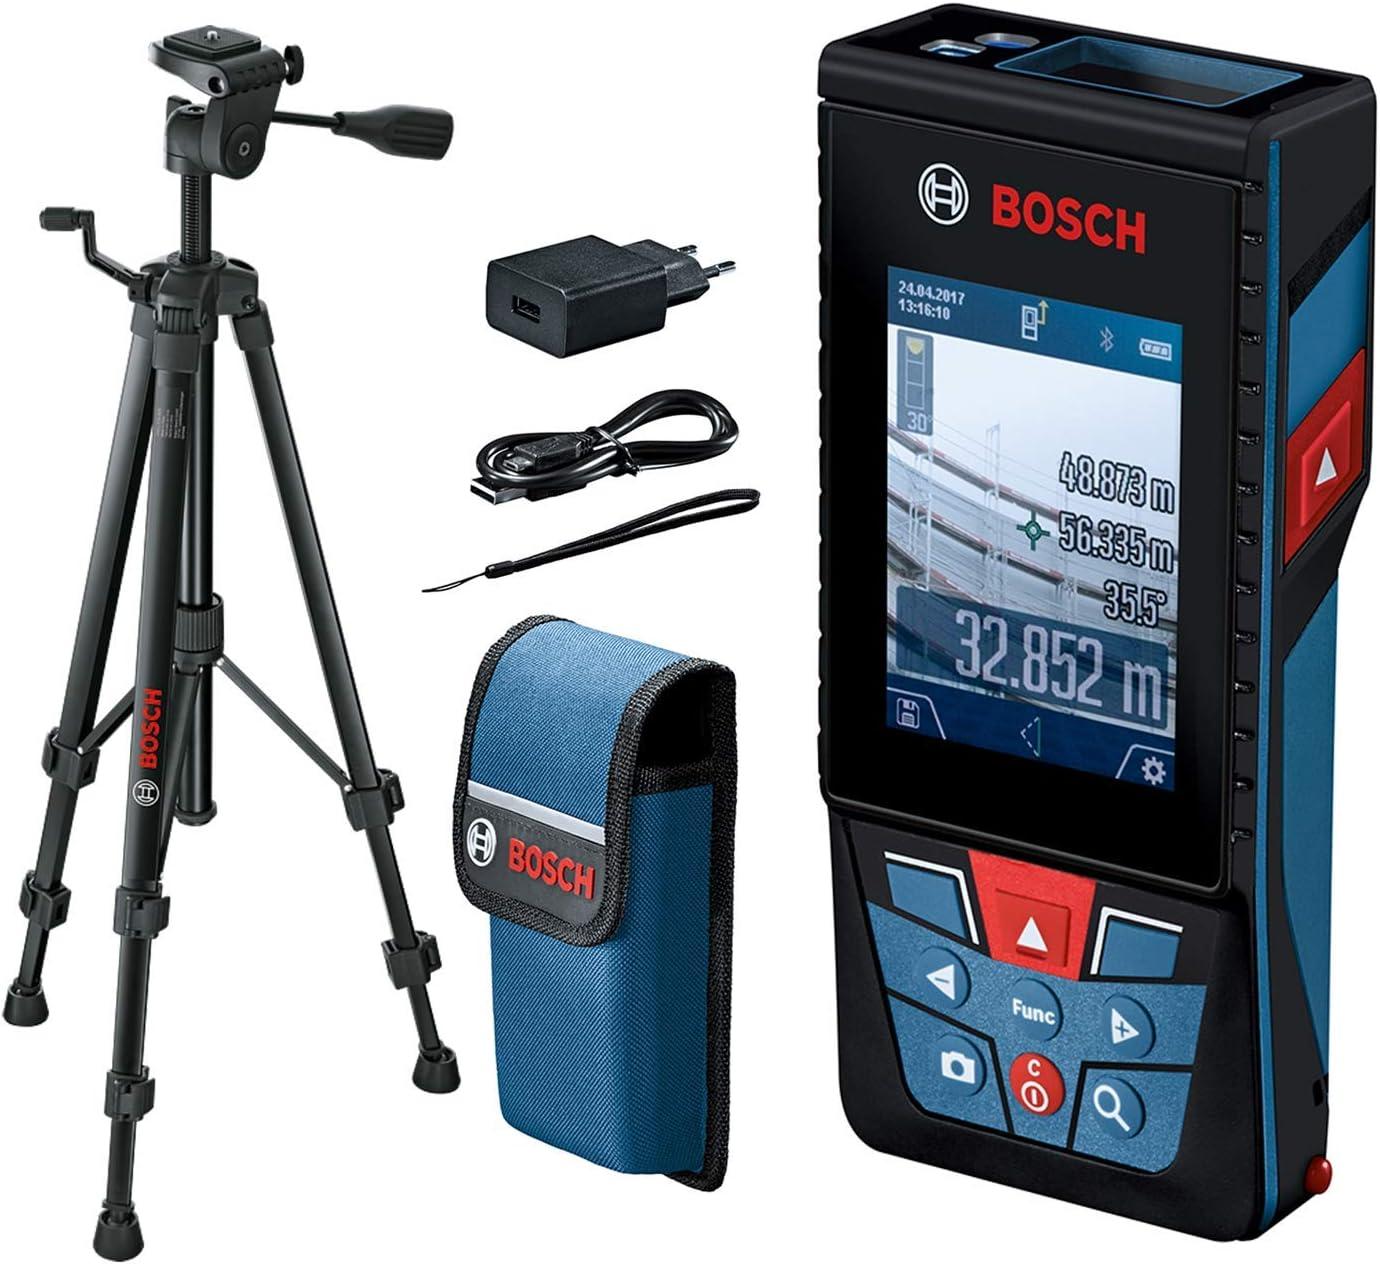 Bosch Professional Medidor láser de distancia GLM 120 C (cámara integrada, transmisión de datos Bluetooth, máx. distancia:120 m, cable micro USB, cargador, correa de transporte, funda, trípode BT 150)